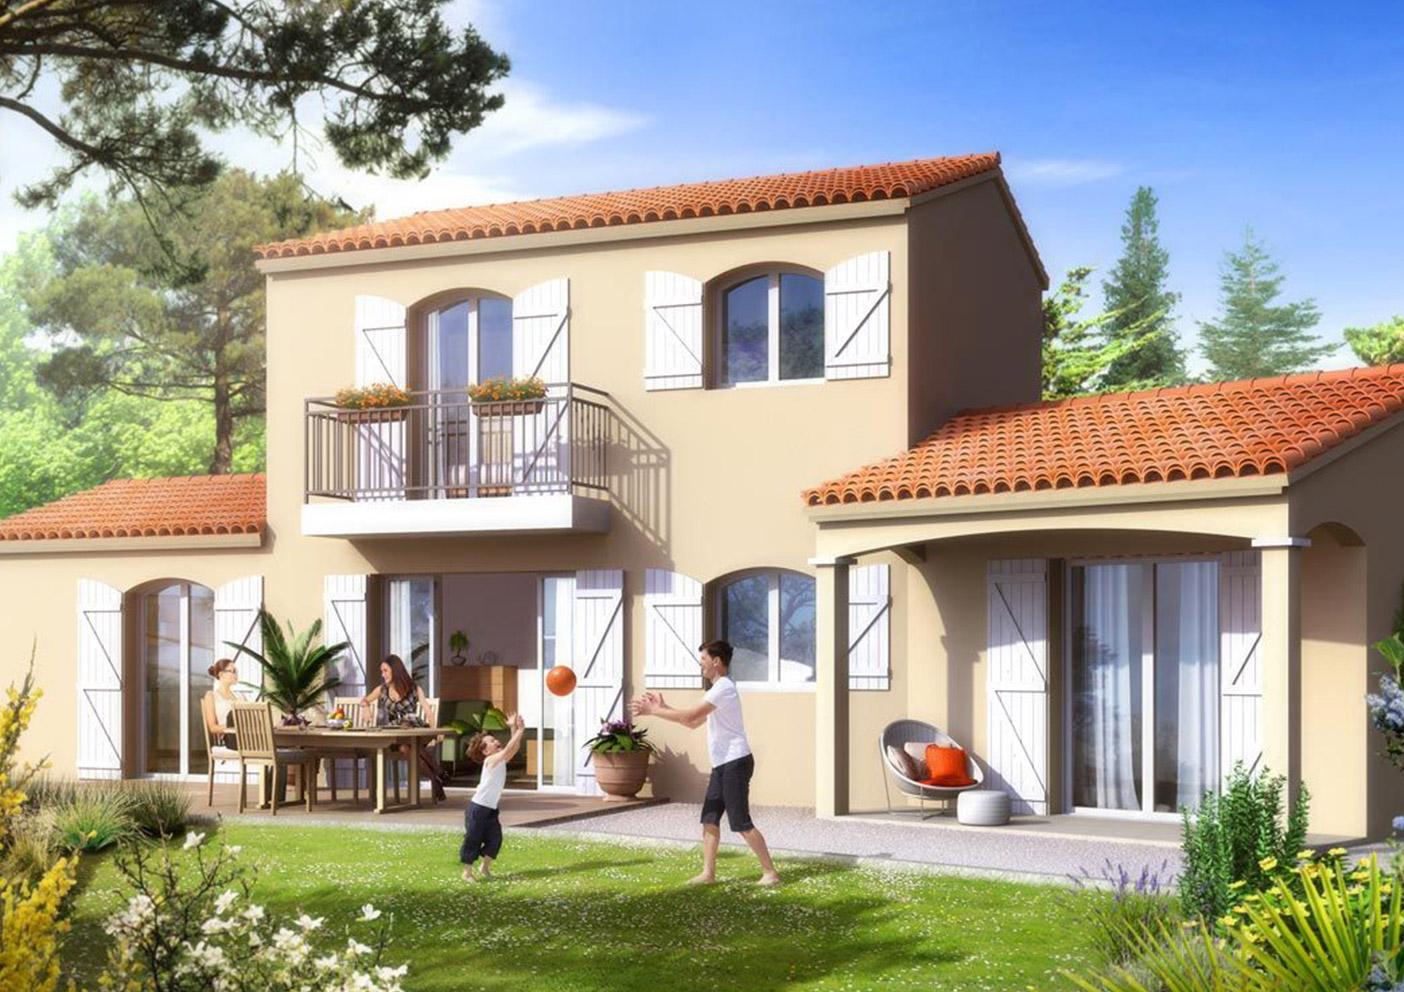 Programme immobilier neuf ajaccio corse immobilier for Programme neuf immobilier